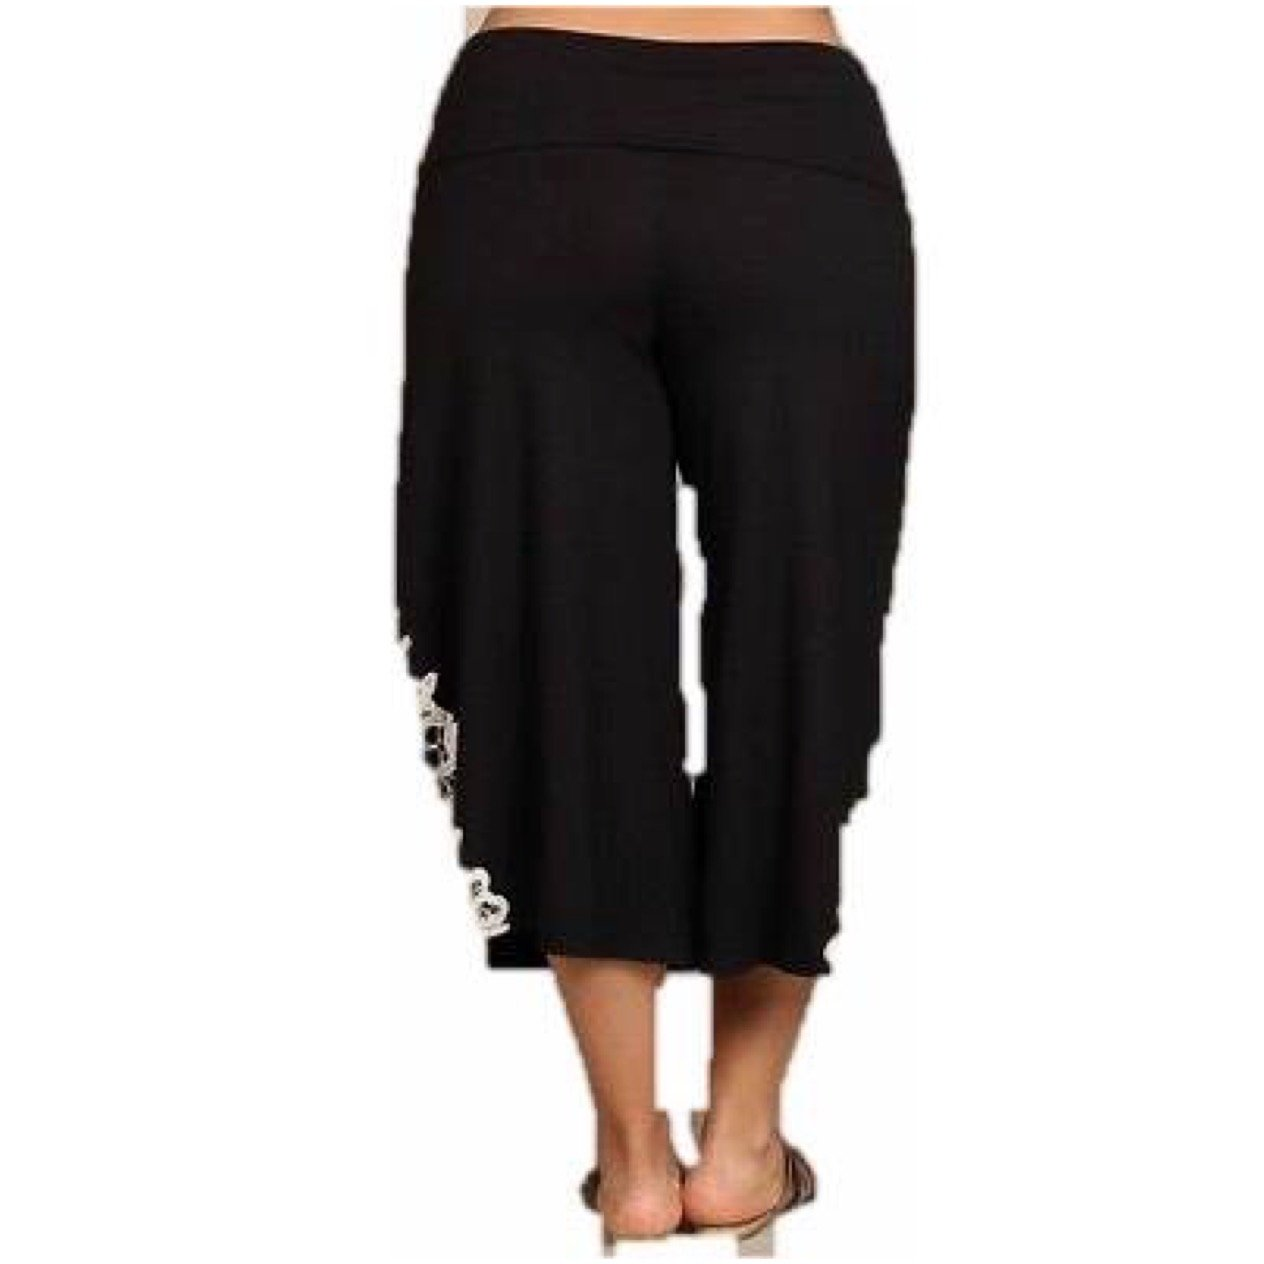 52487b631db Pant Plus Gaucho High Waist 1X 2X 3X Crochet Black Capri Wide Leg Bohemian  Culottes at Amazon Women s Clothing store